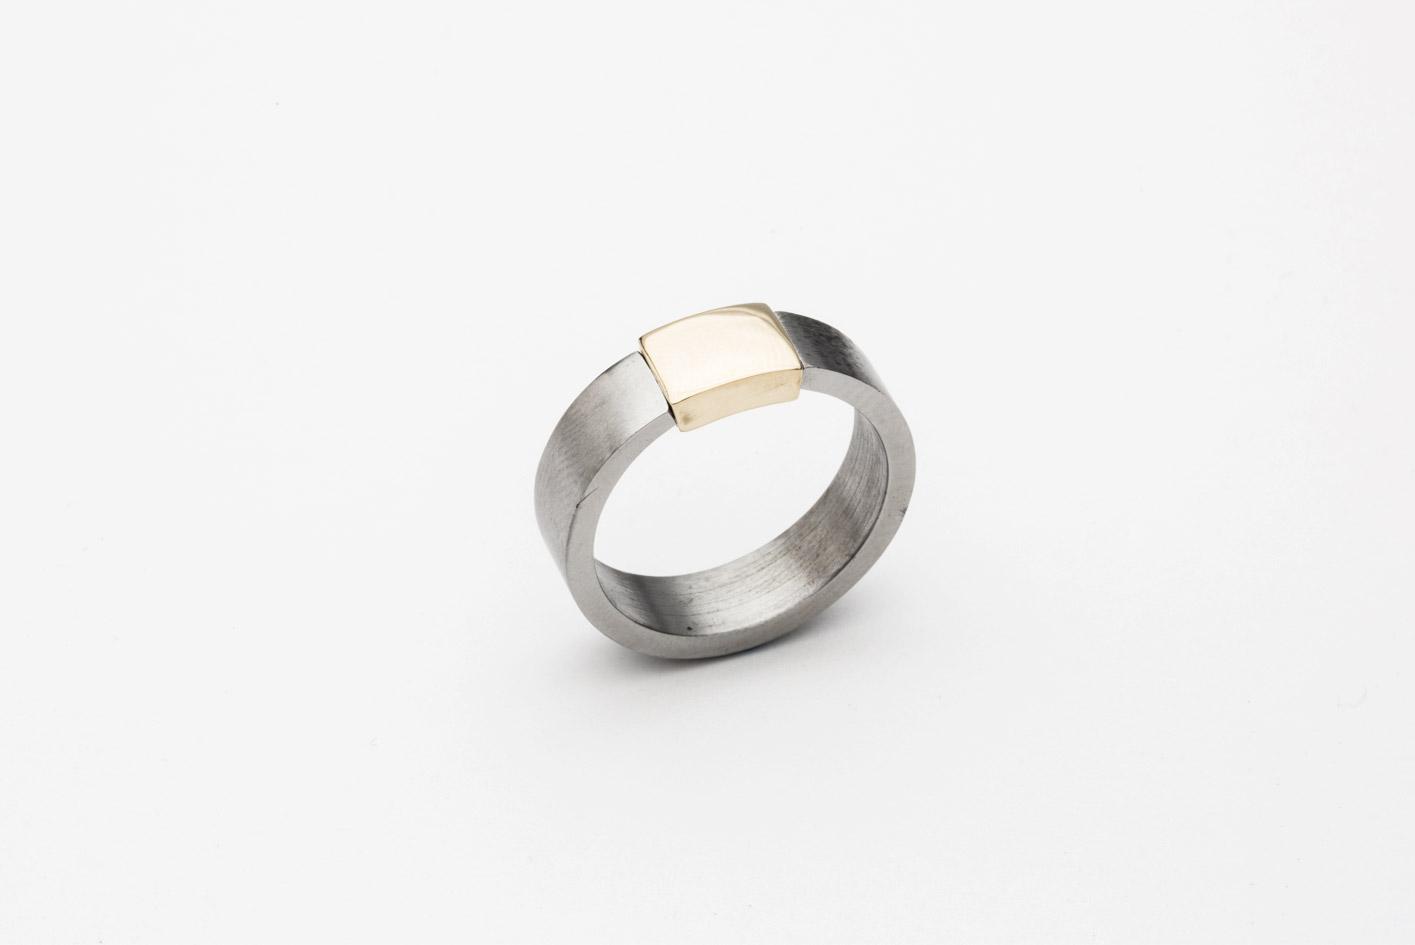 Barrel Band Shotgun Ring